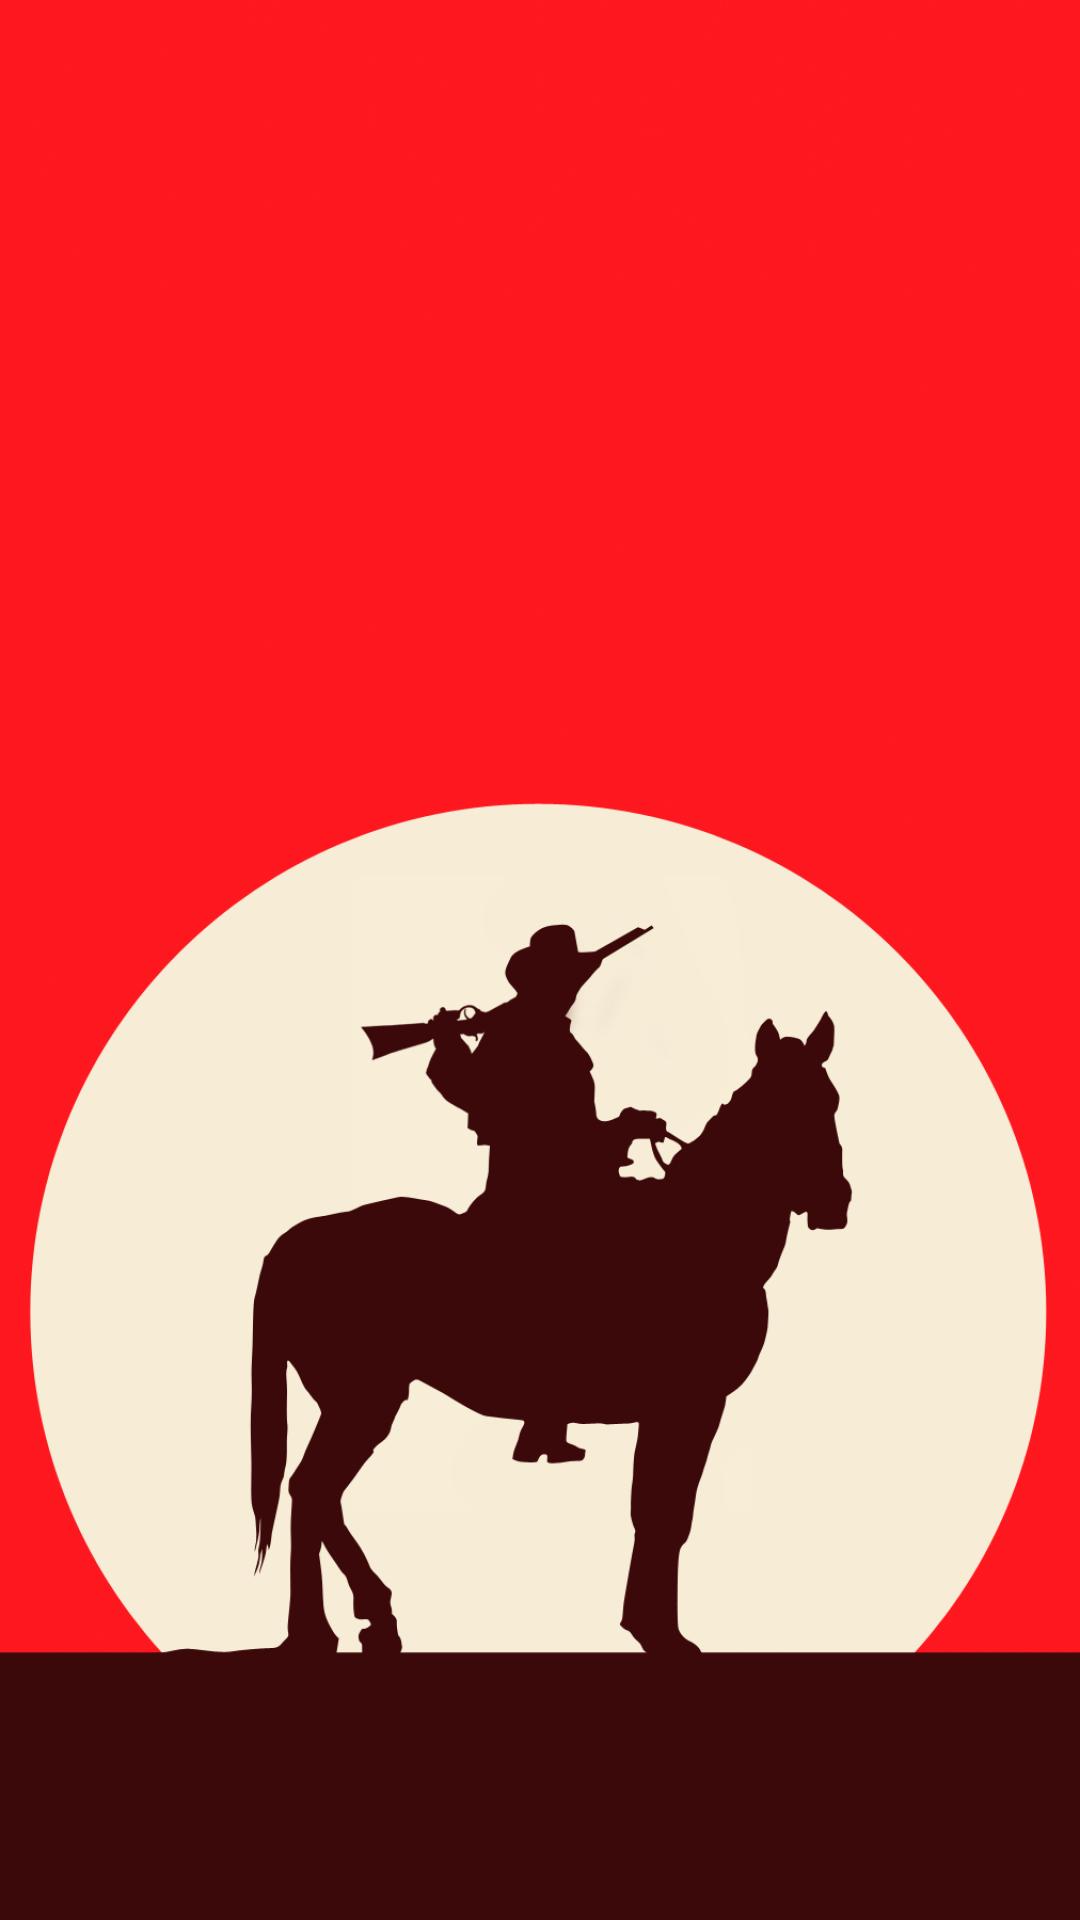 1080x1920 Artistic Cowboy Horse Red Western Red Dead Redemption. Nola Jazz